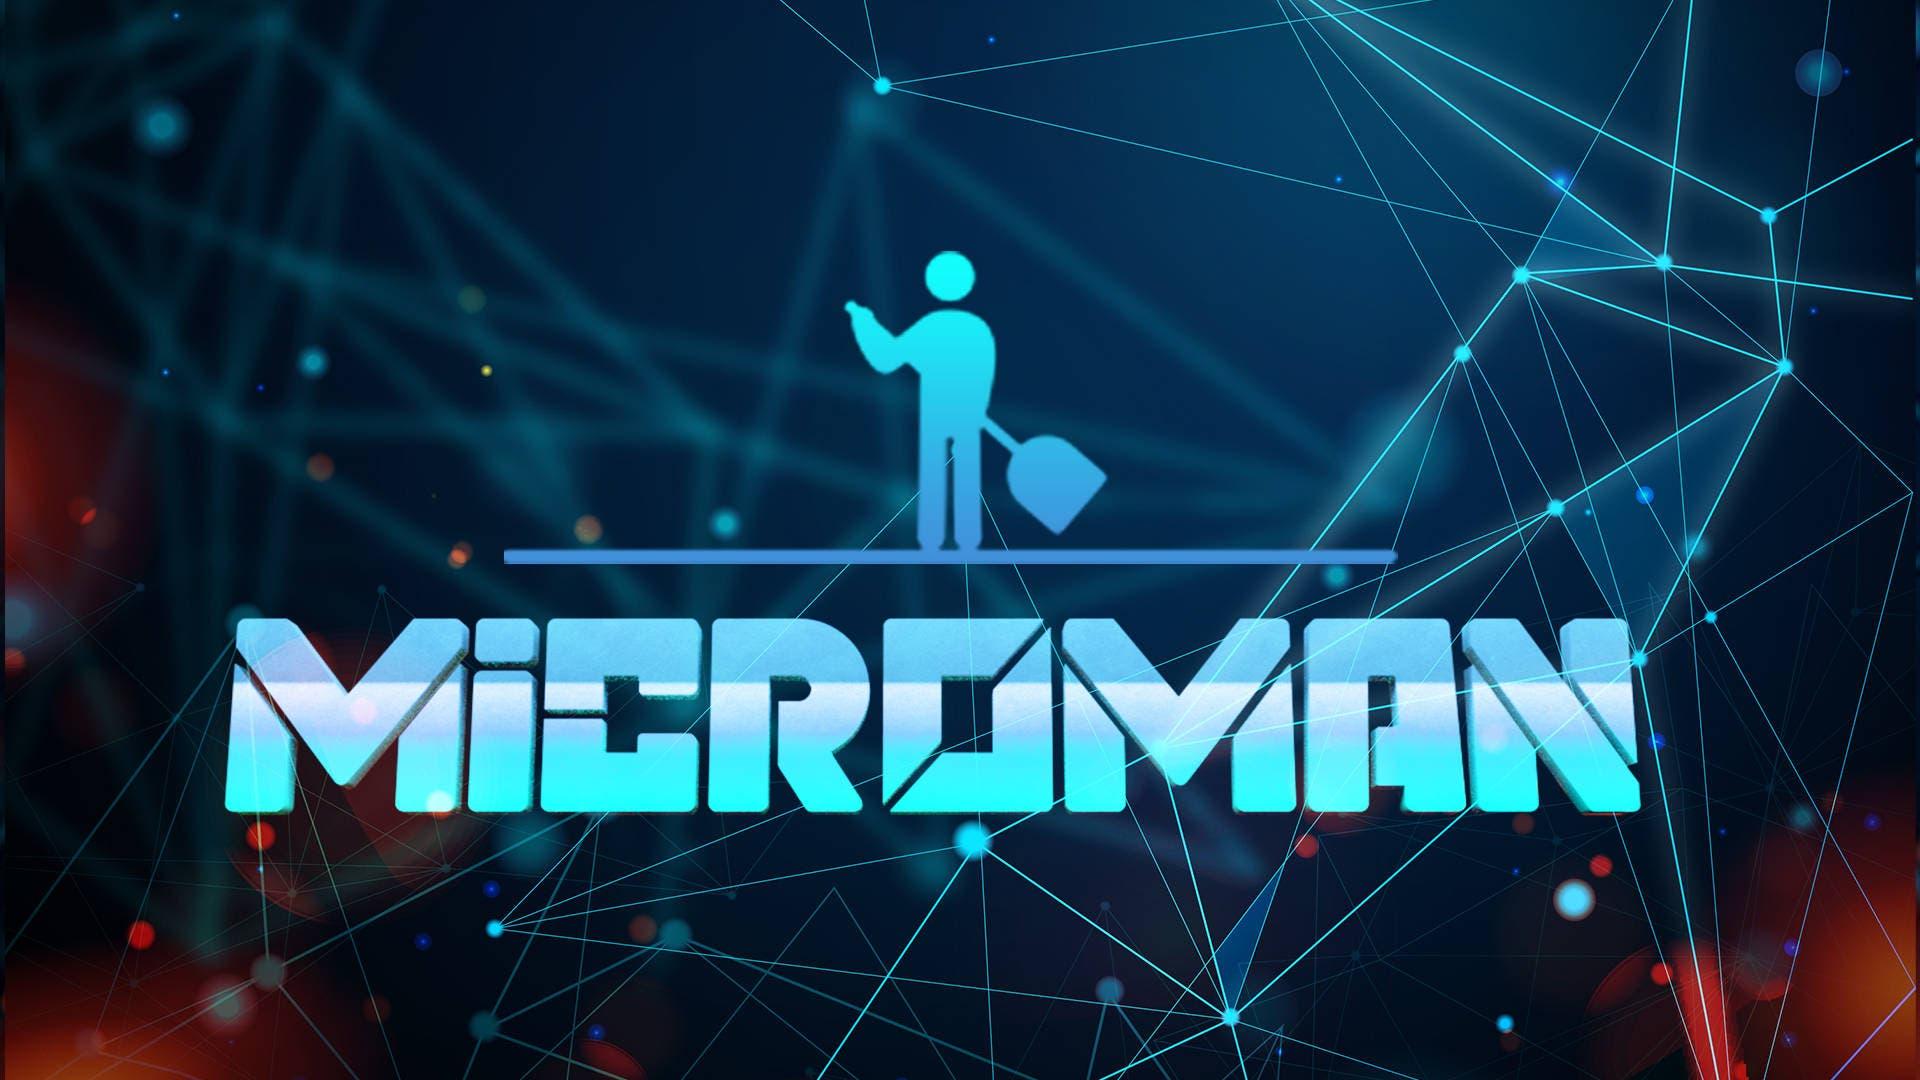 MicroMan anunciado para Xbox Series X, la prometedora aventura en miniatura de Glob Games Studios